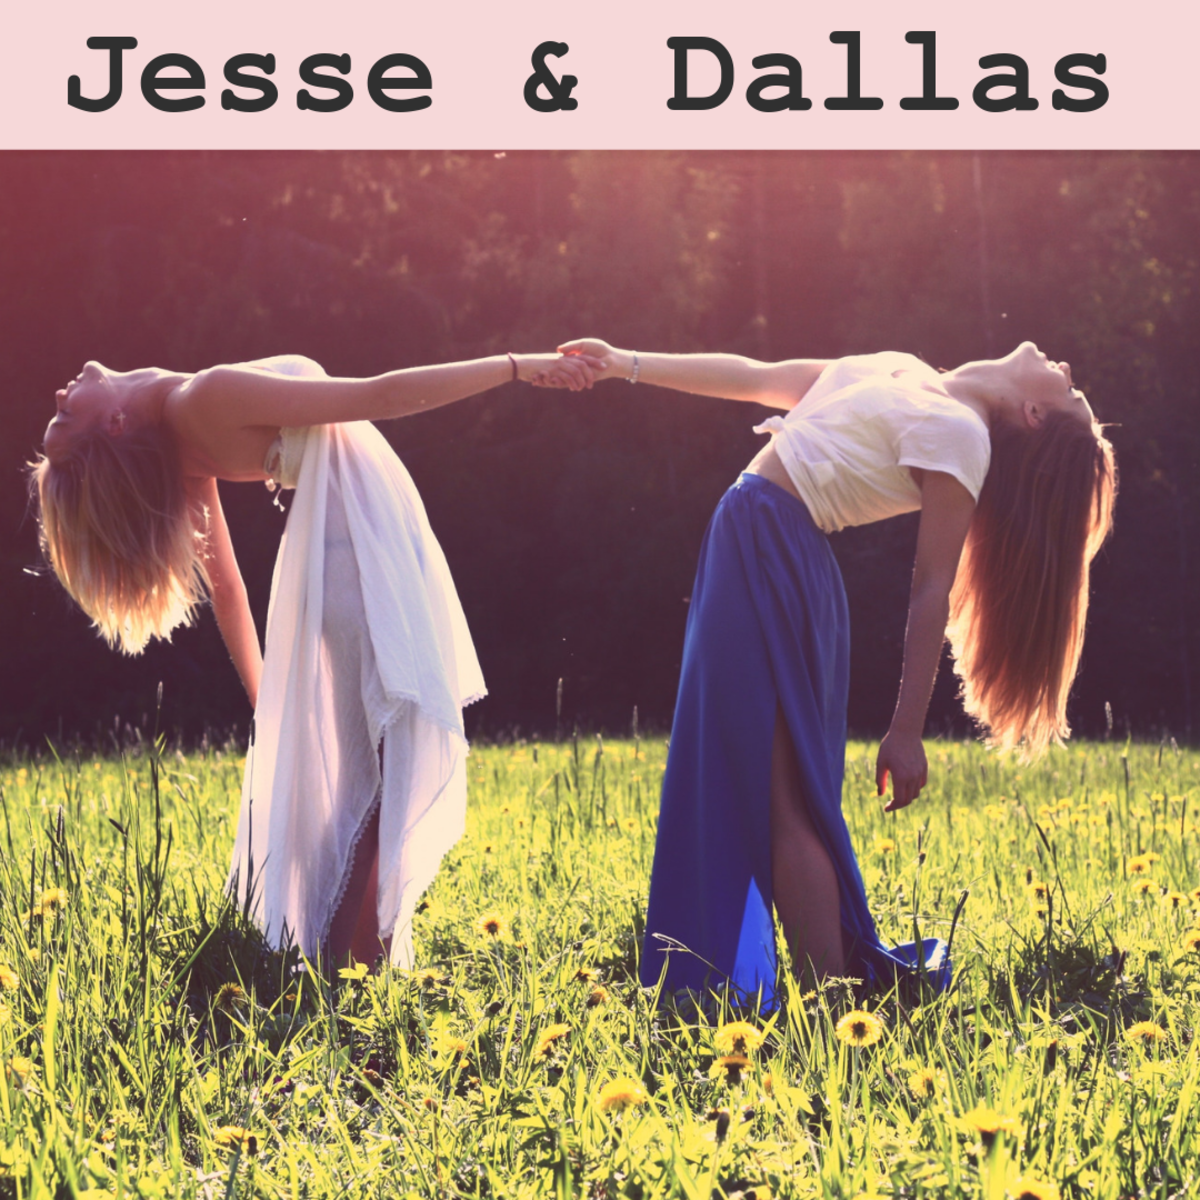 Jesse & Dallas